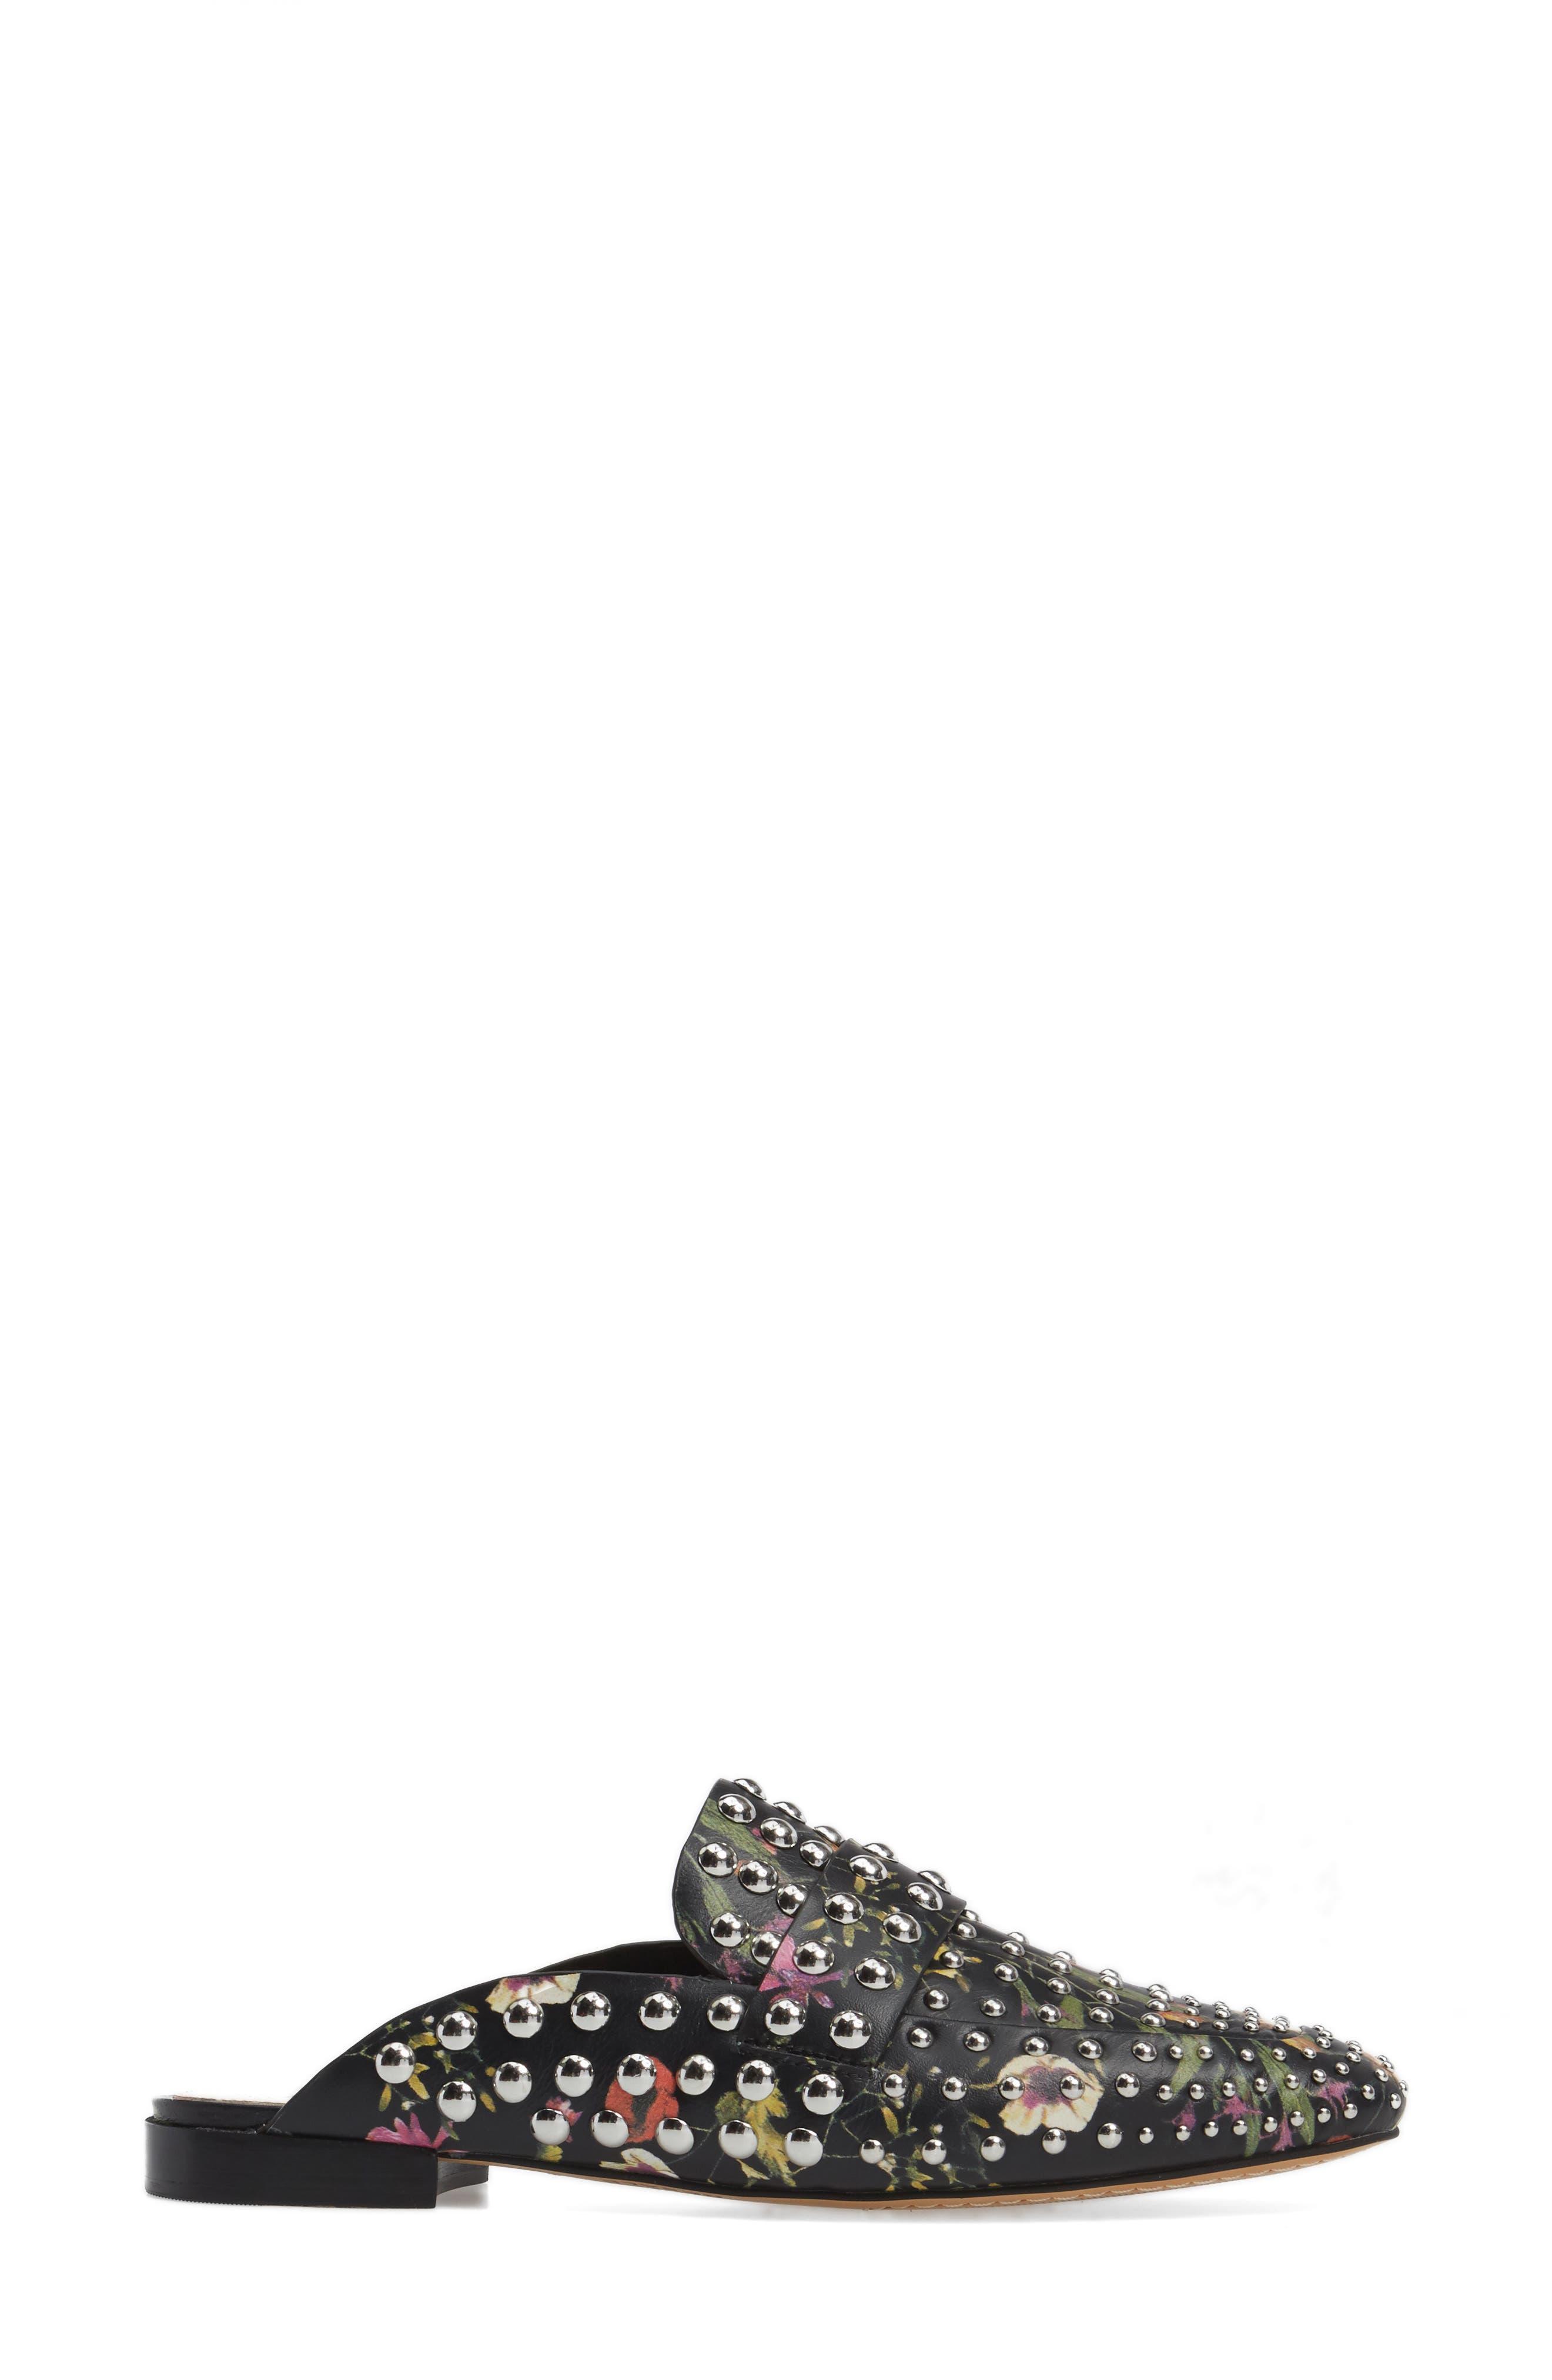 Sessa Studded Loafer Mule,                             Alternate thumbnail 4, color,                             Black Floral Leather